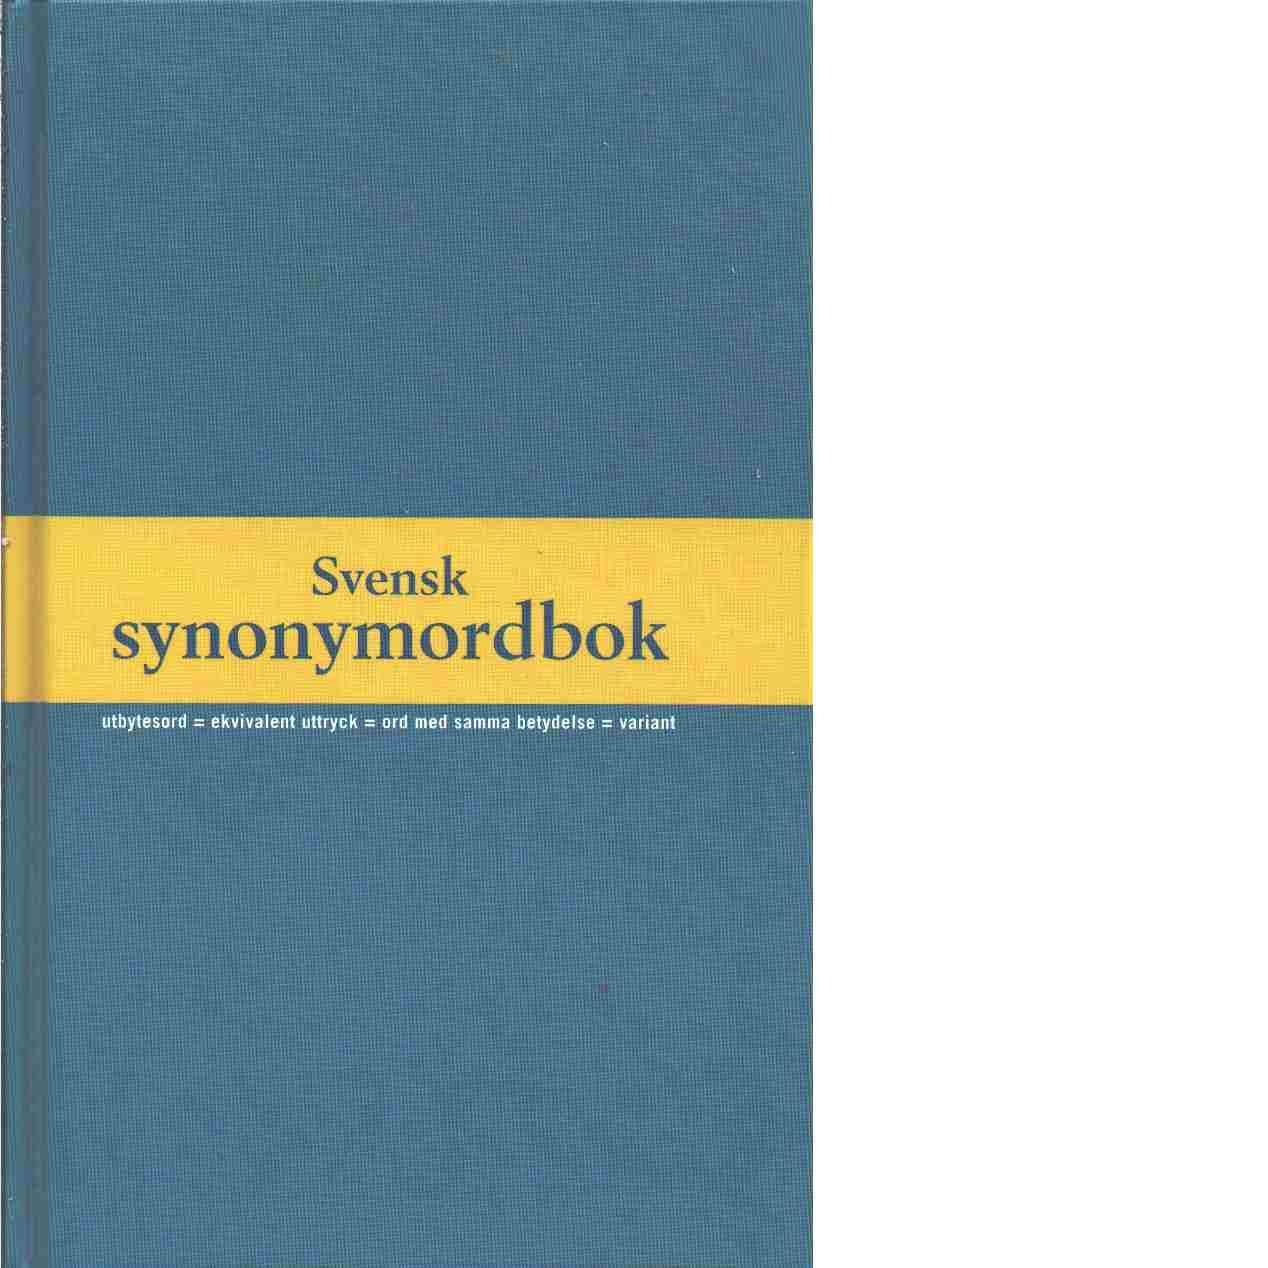 Svensk synonymordbok - Swedenborg, Lillemor